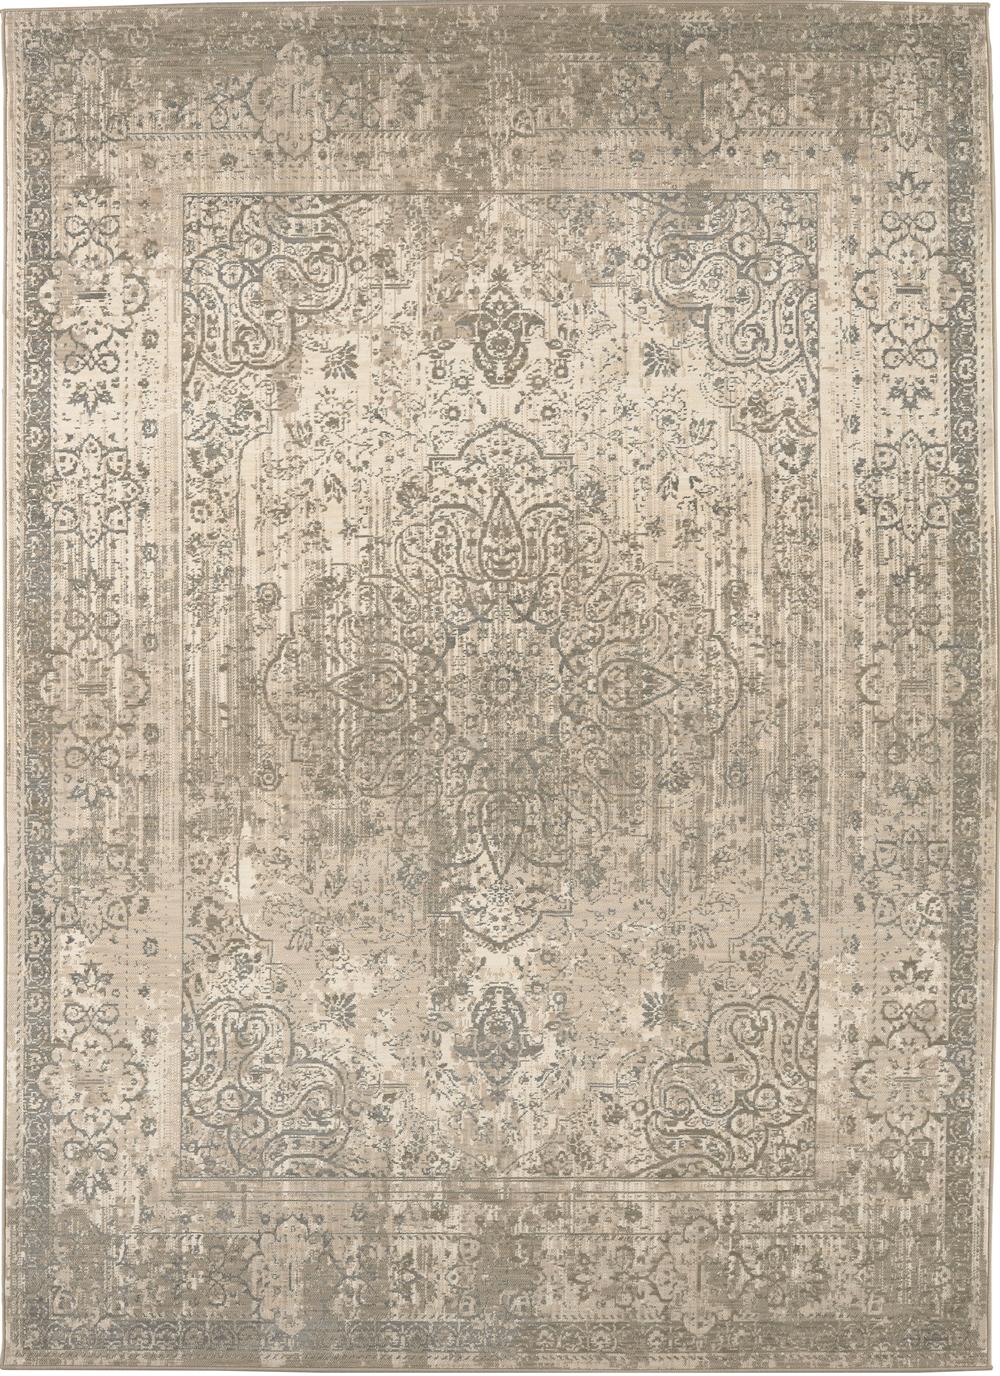 Karastan Kismet Karma Silver Natural Cotton Rug